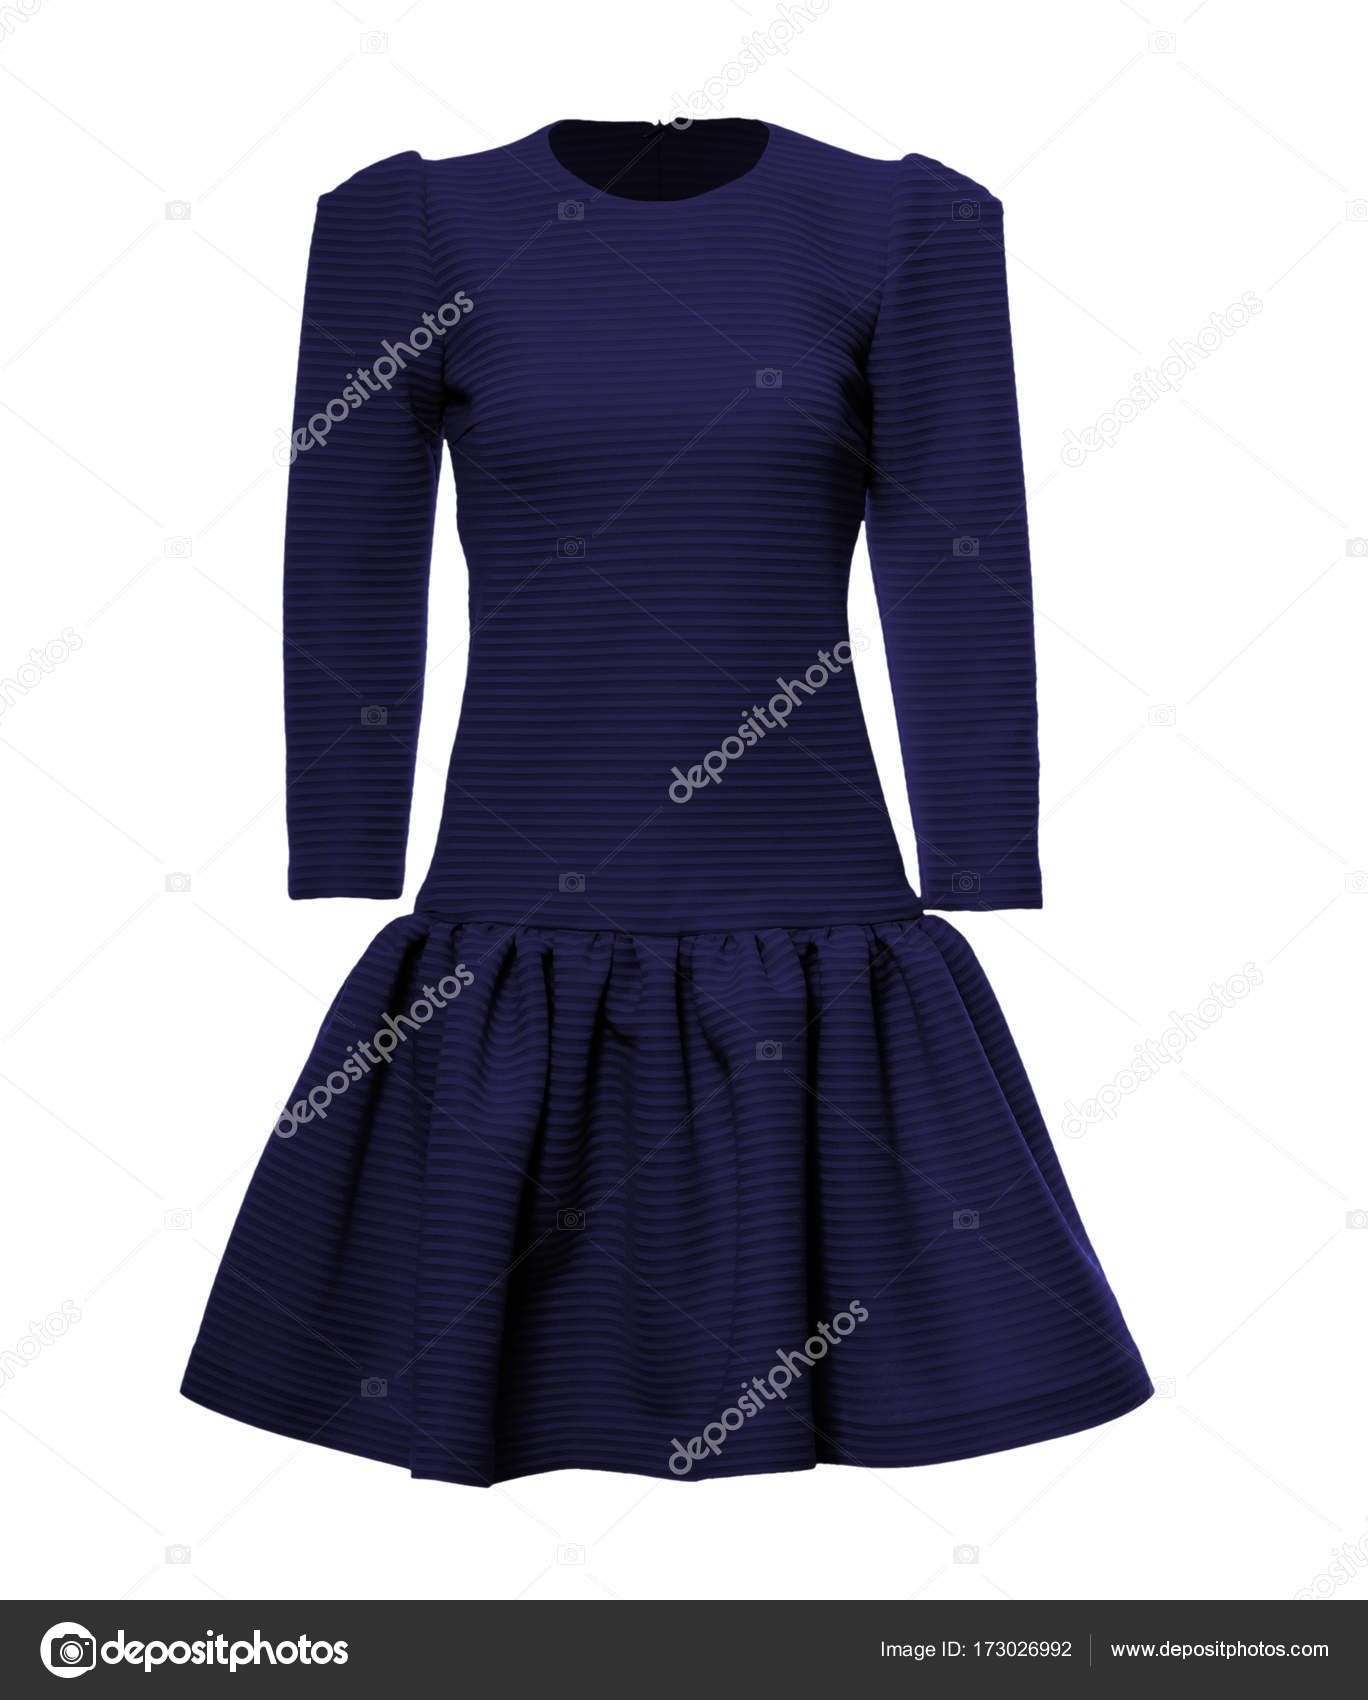 Elegante Hermoso Vestido Azul Oscuro Sobre Fondo Blanco Con